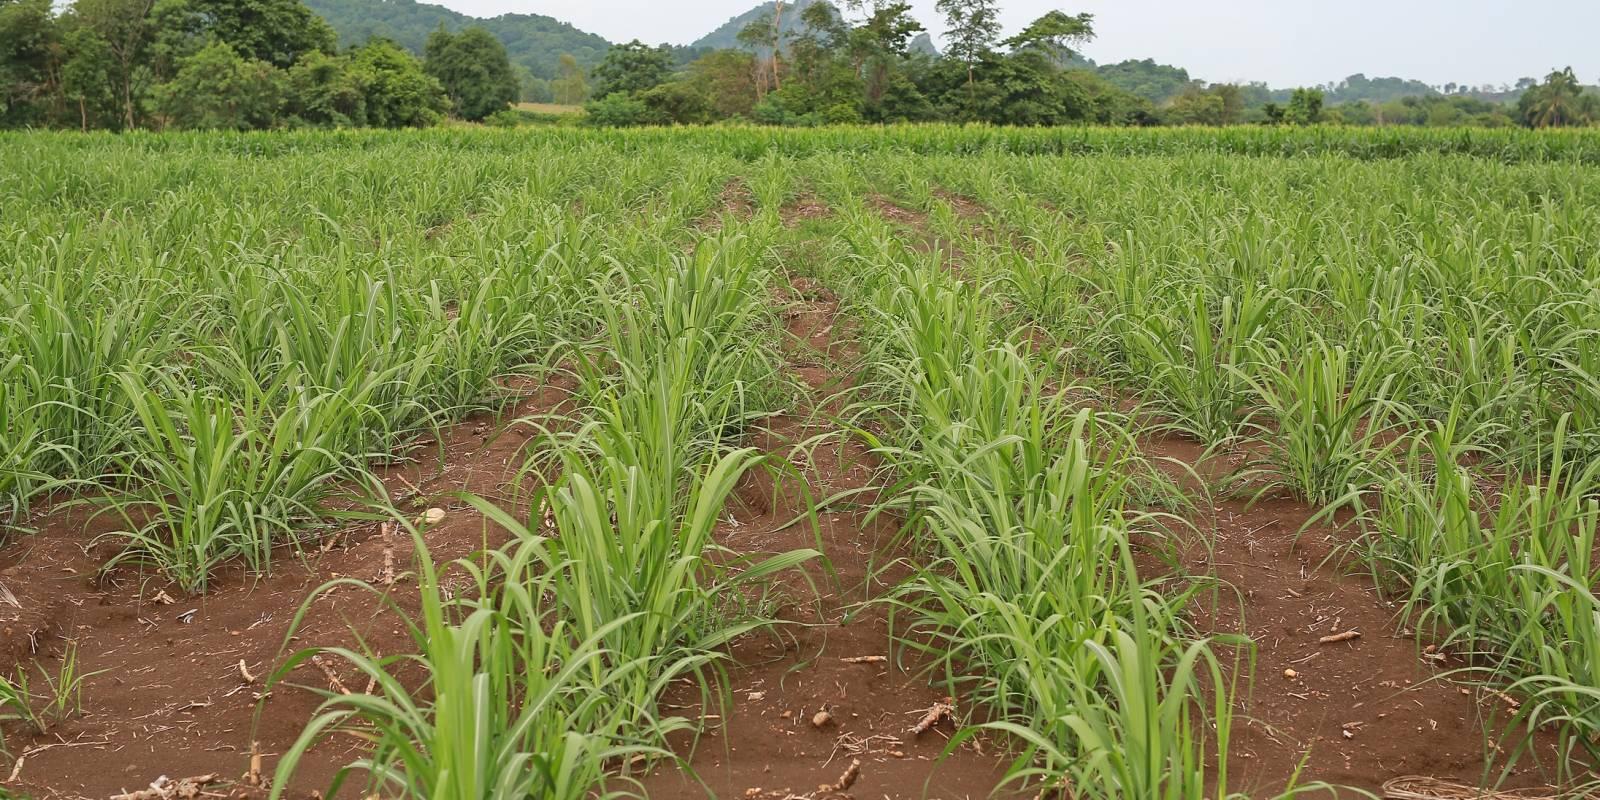 Sugarcane for sugar factories.